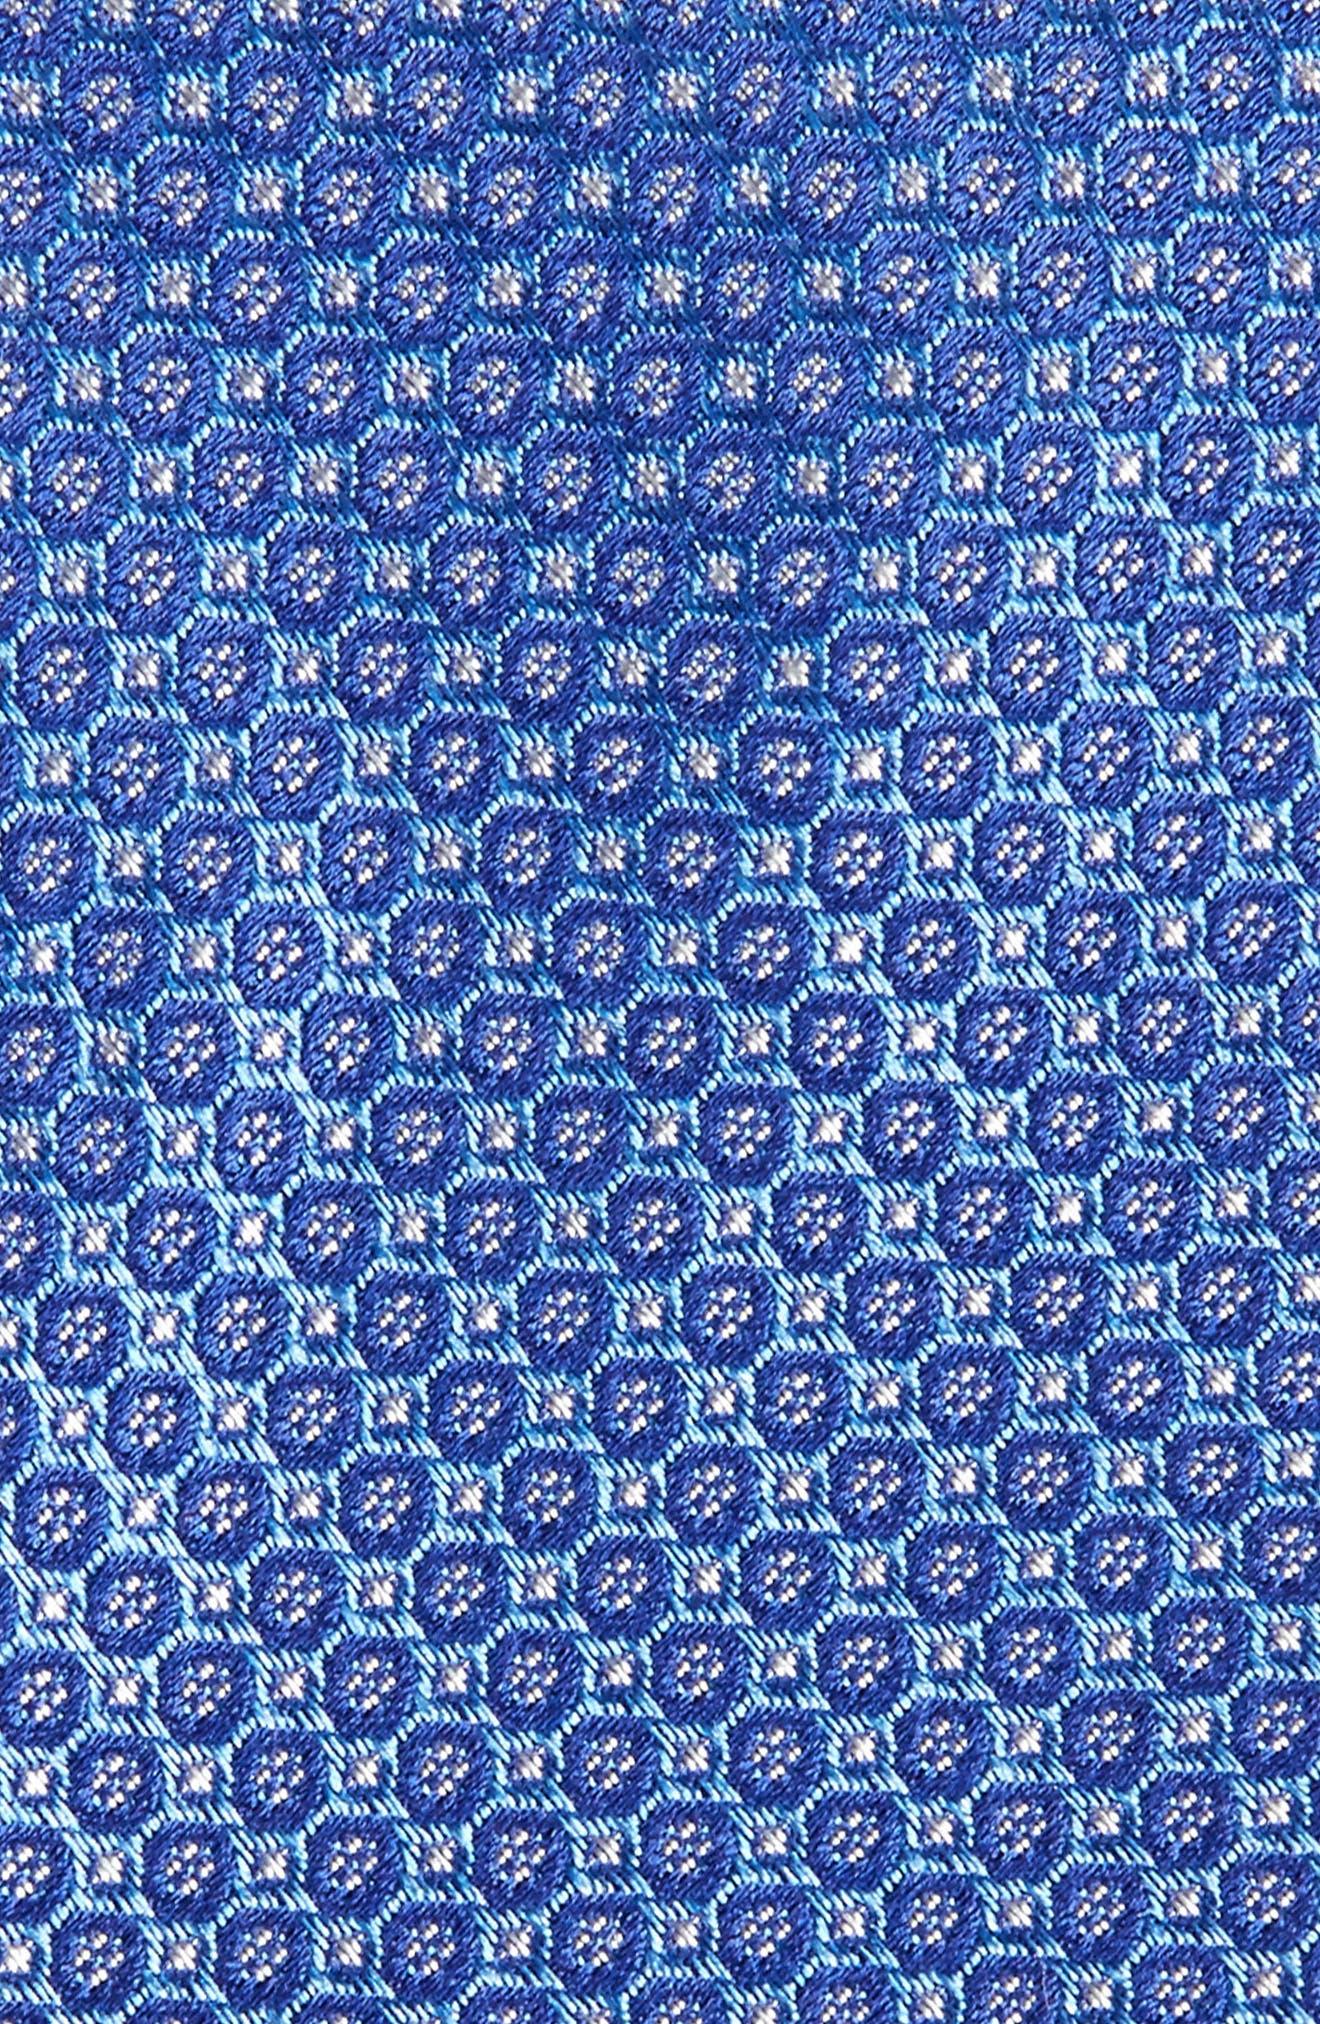 Park Ave Solid Silk Tie,                             Alternate thumbnail 2, color,                             400